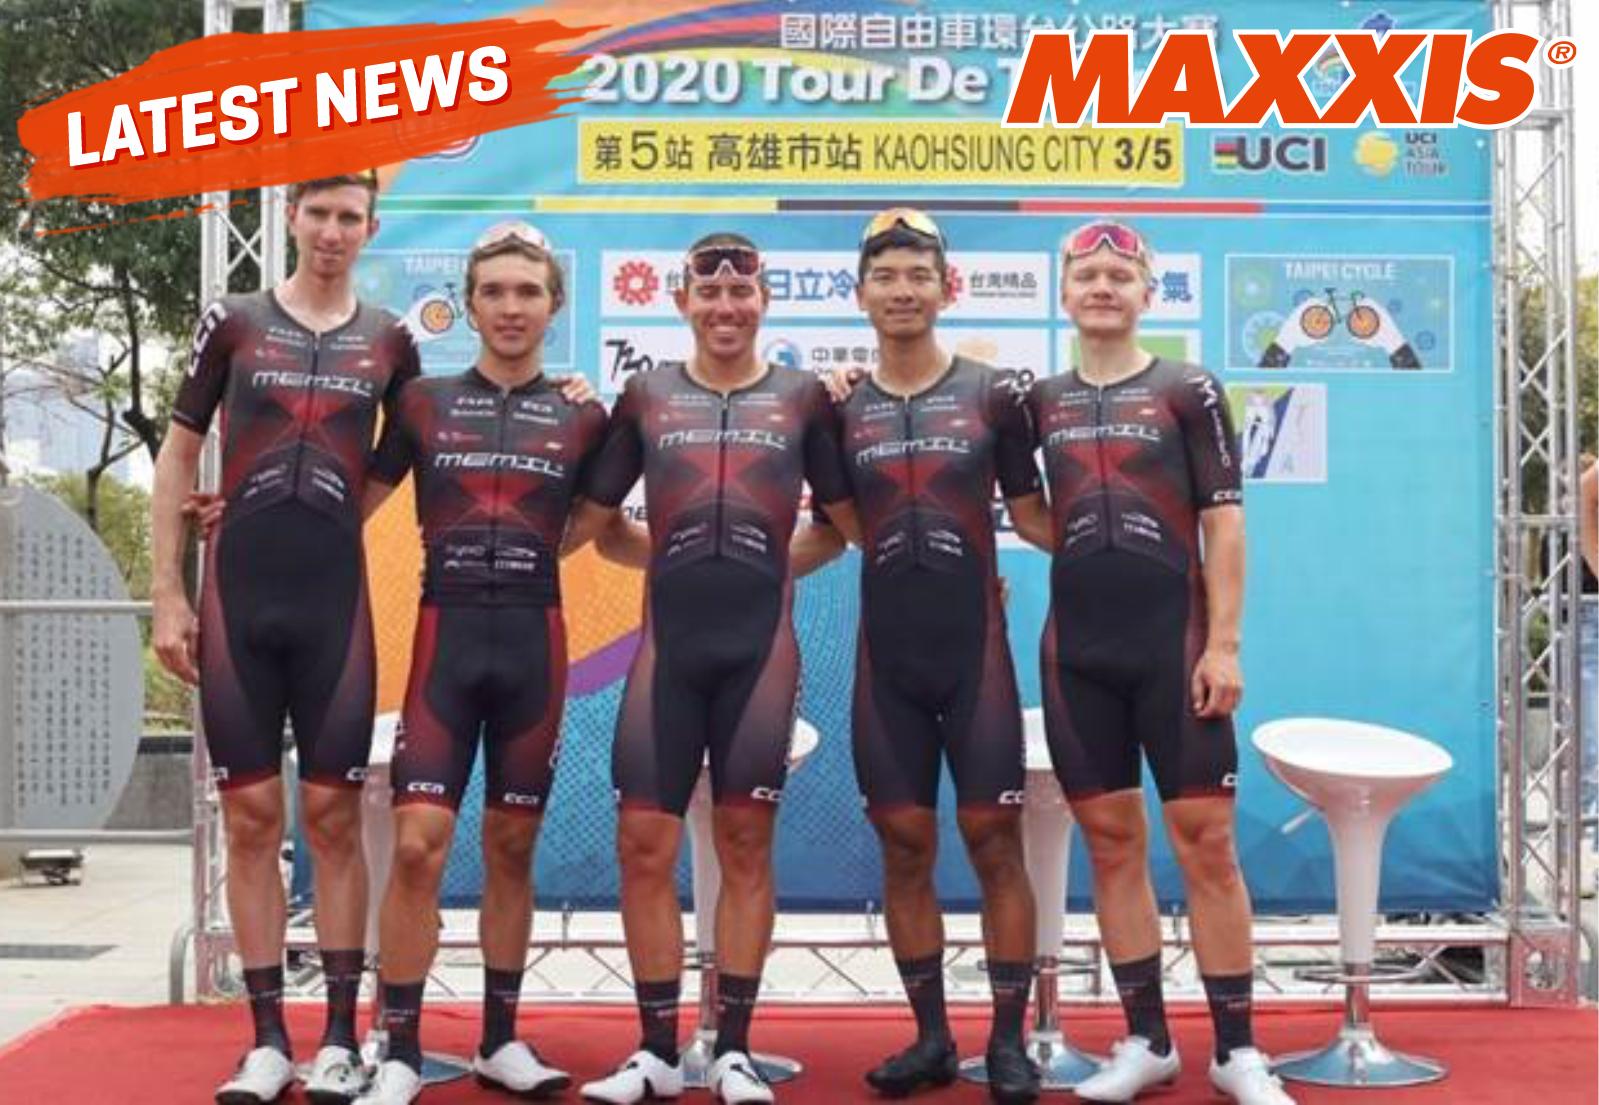 Maxxis Bersinar Di Kompetisi Tour De Taiwan 2020